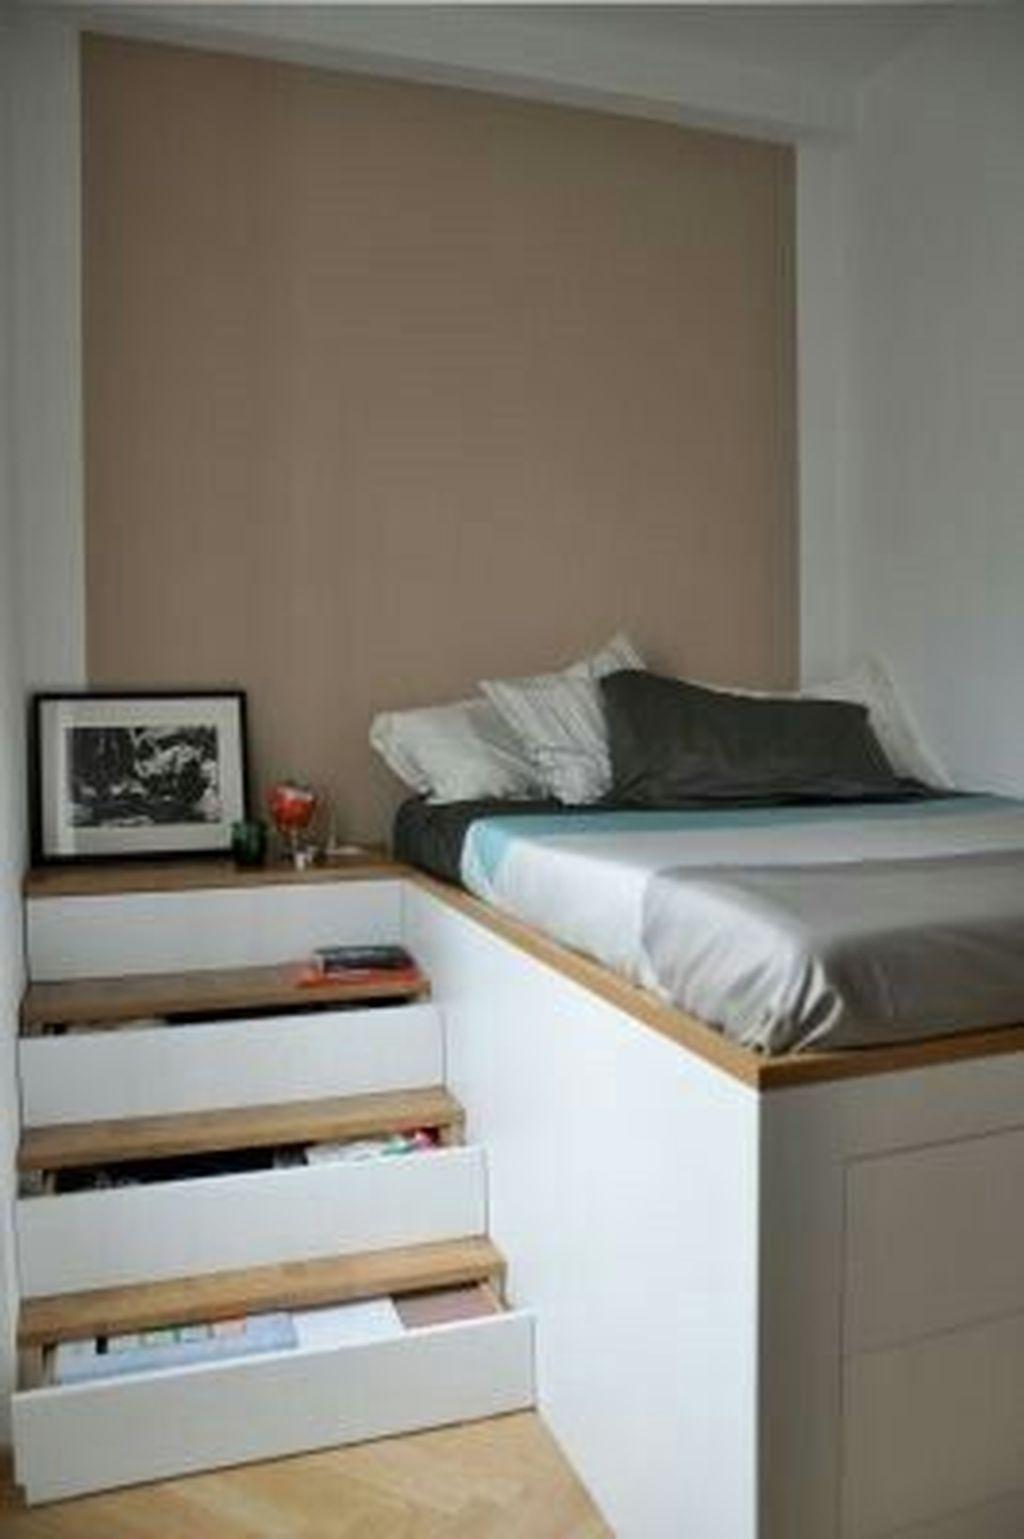 Platform Bed Bedroom Sets: 43 Smart Tiny Bedrooms Design Ideas With Huge Style